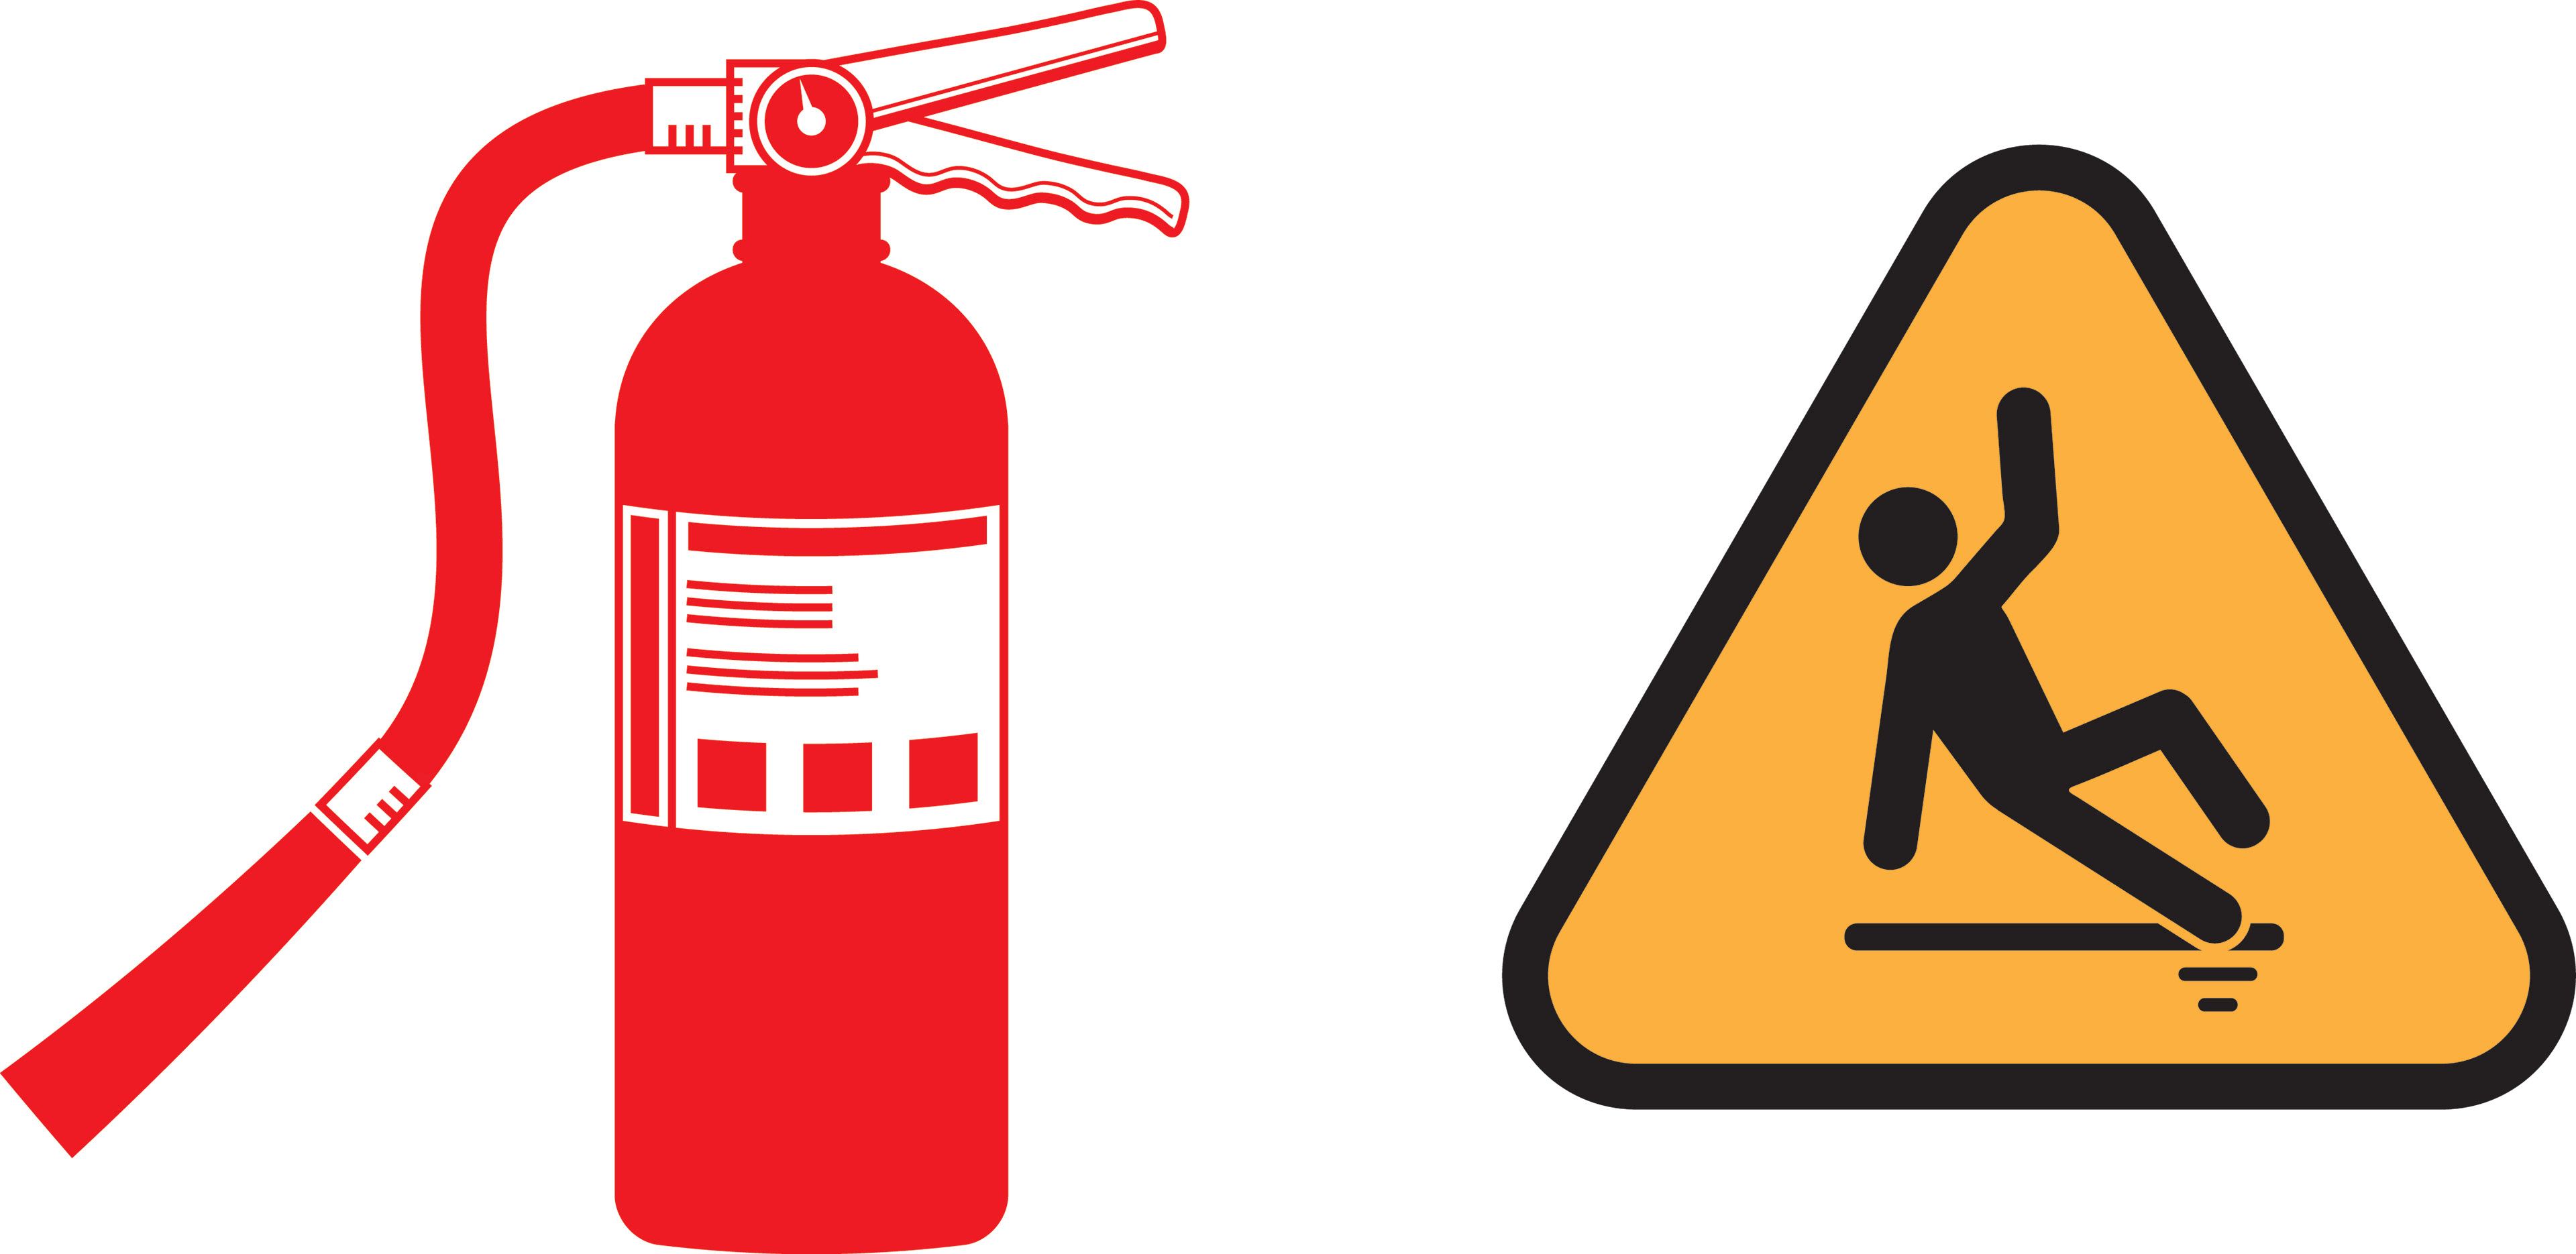 travis seek safety icons